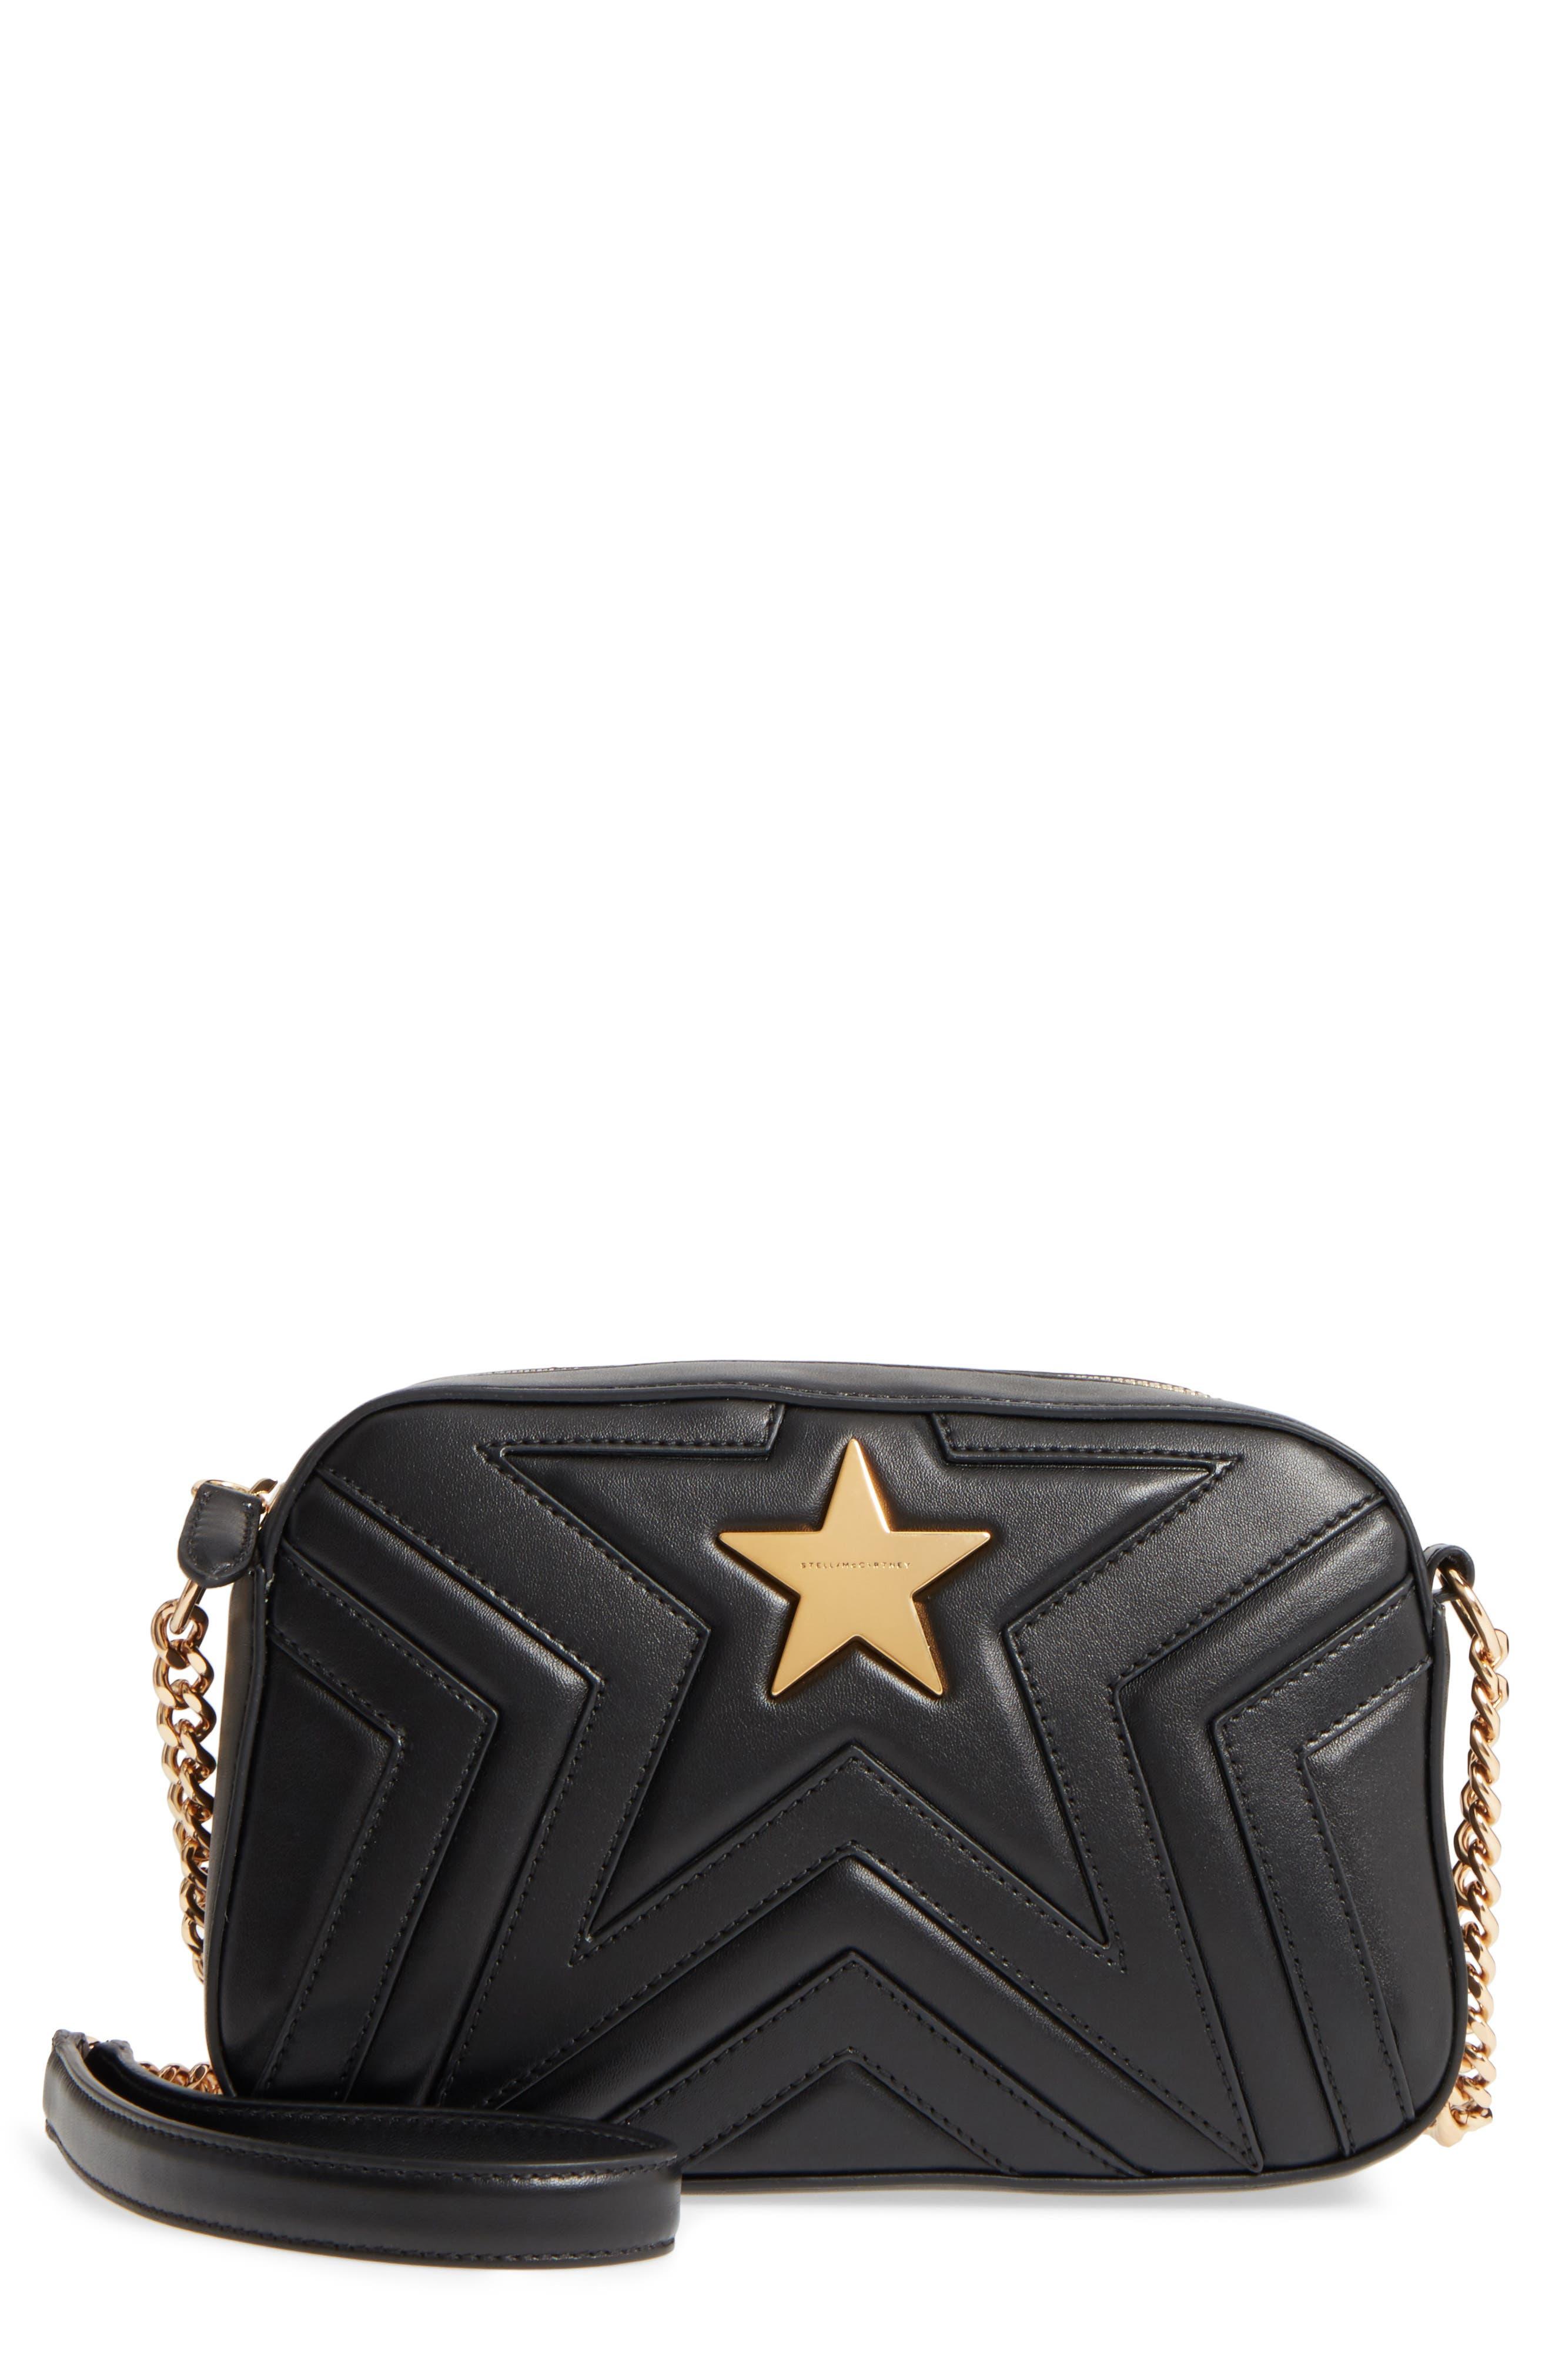 Alter Nappa Faux Leather Shoulder Bag,                             Main thumbnail 1, color,                             BLACK